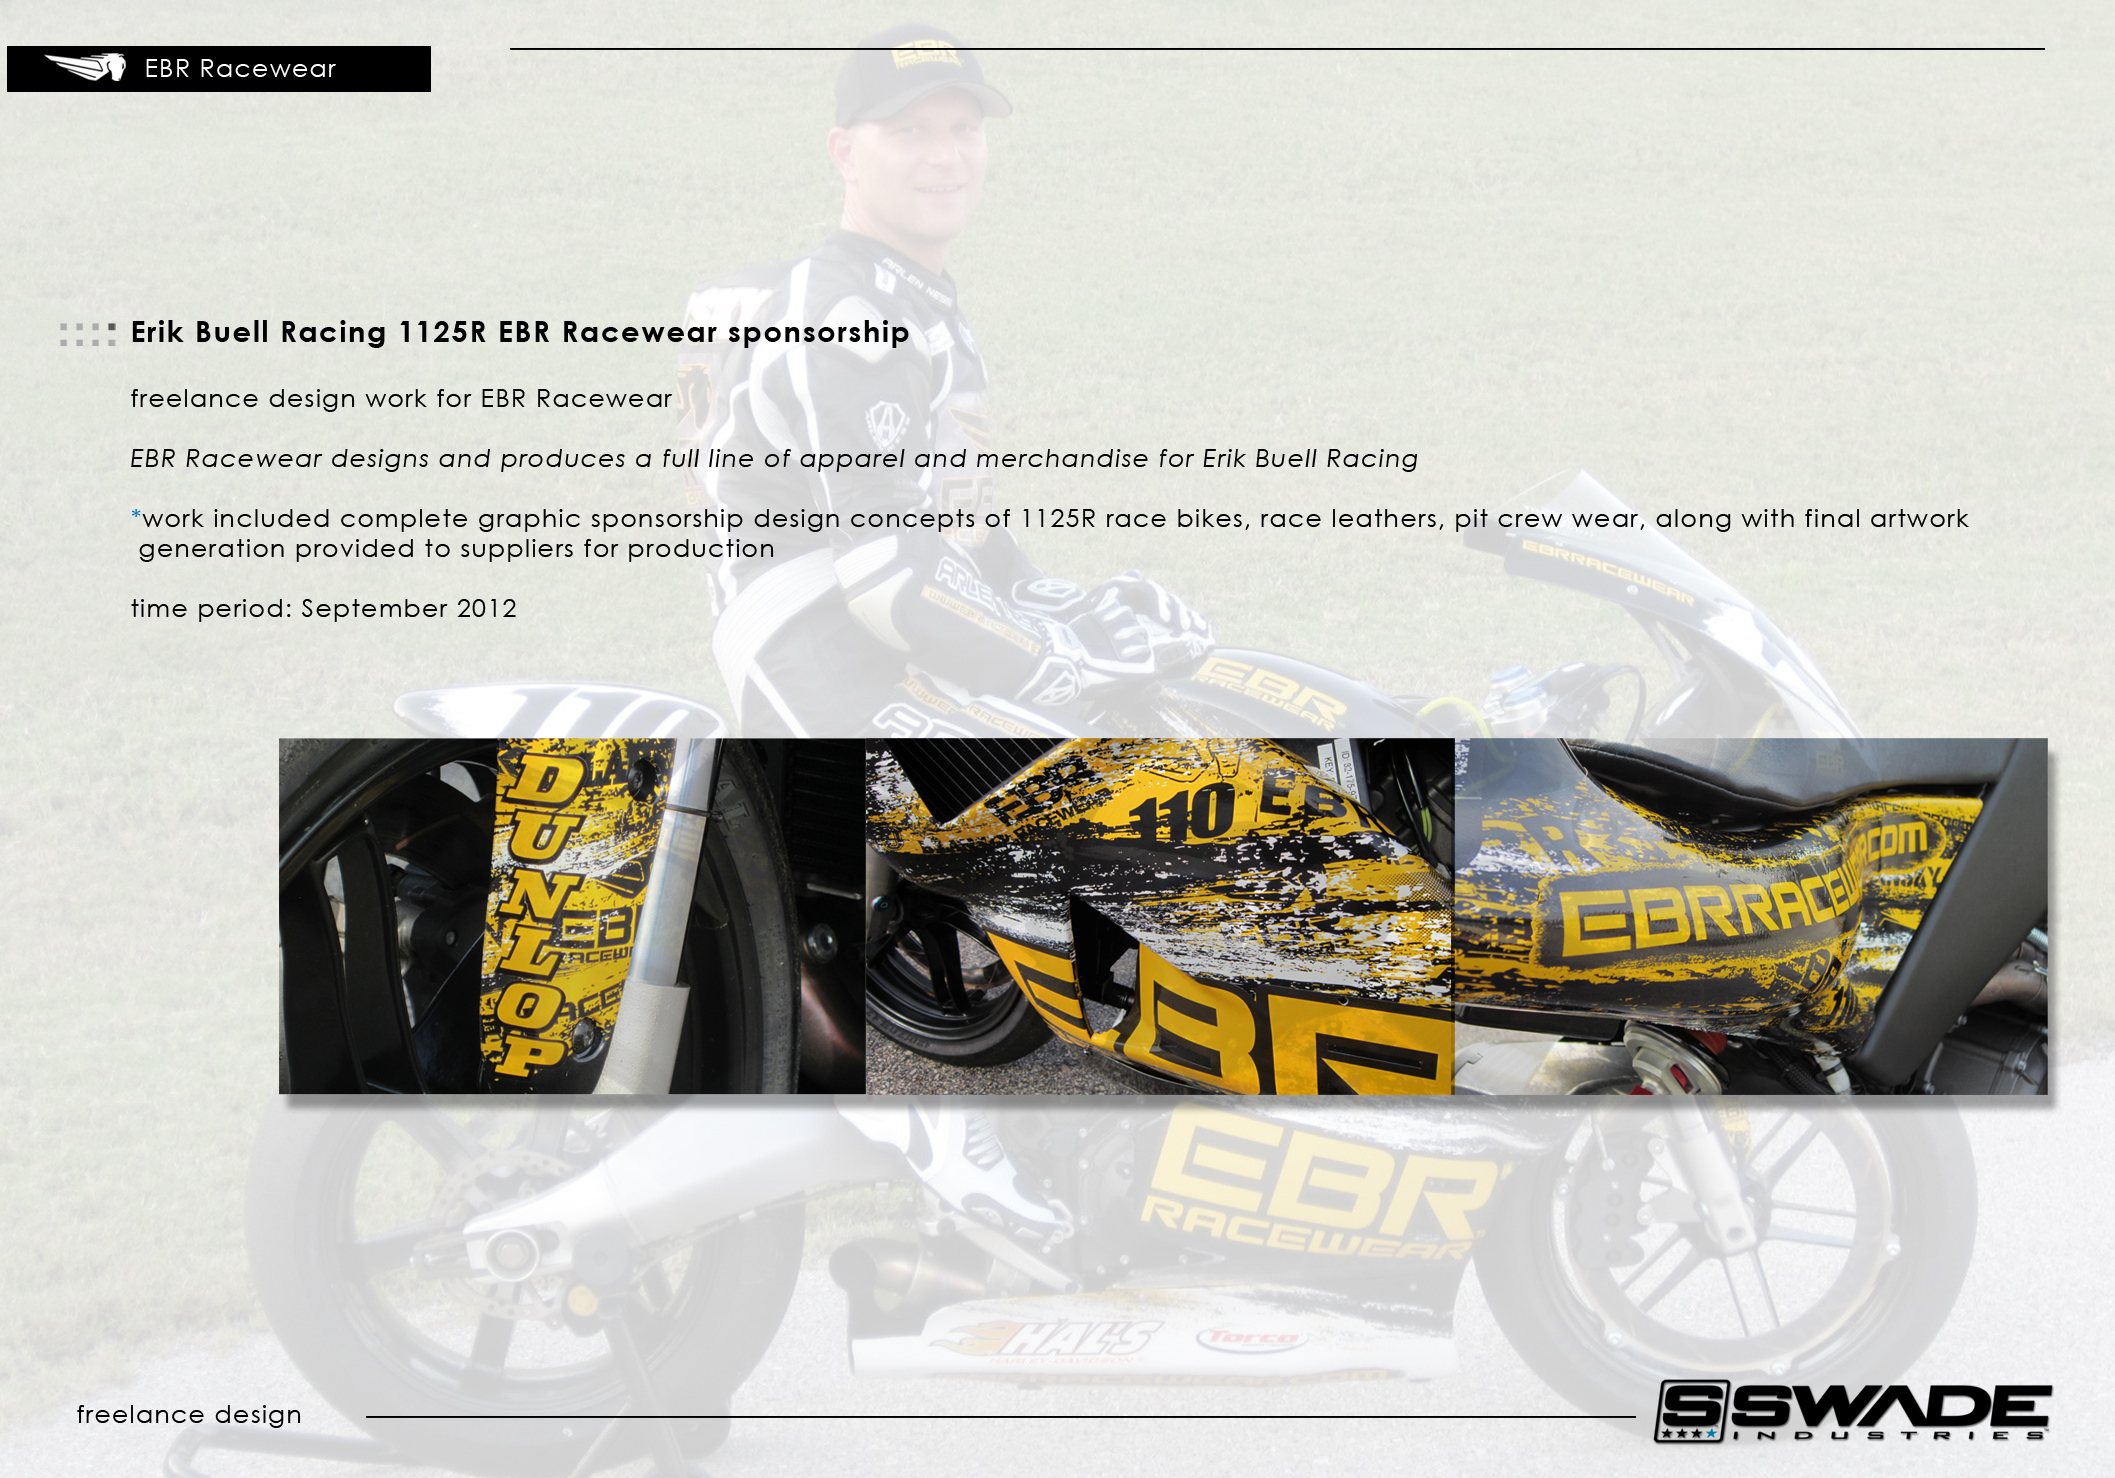 ebr racewear sponsorship by swade industries   todd